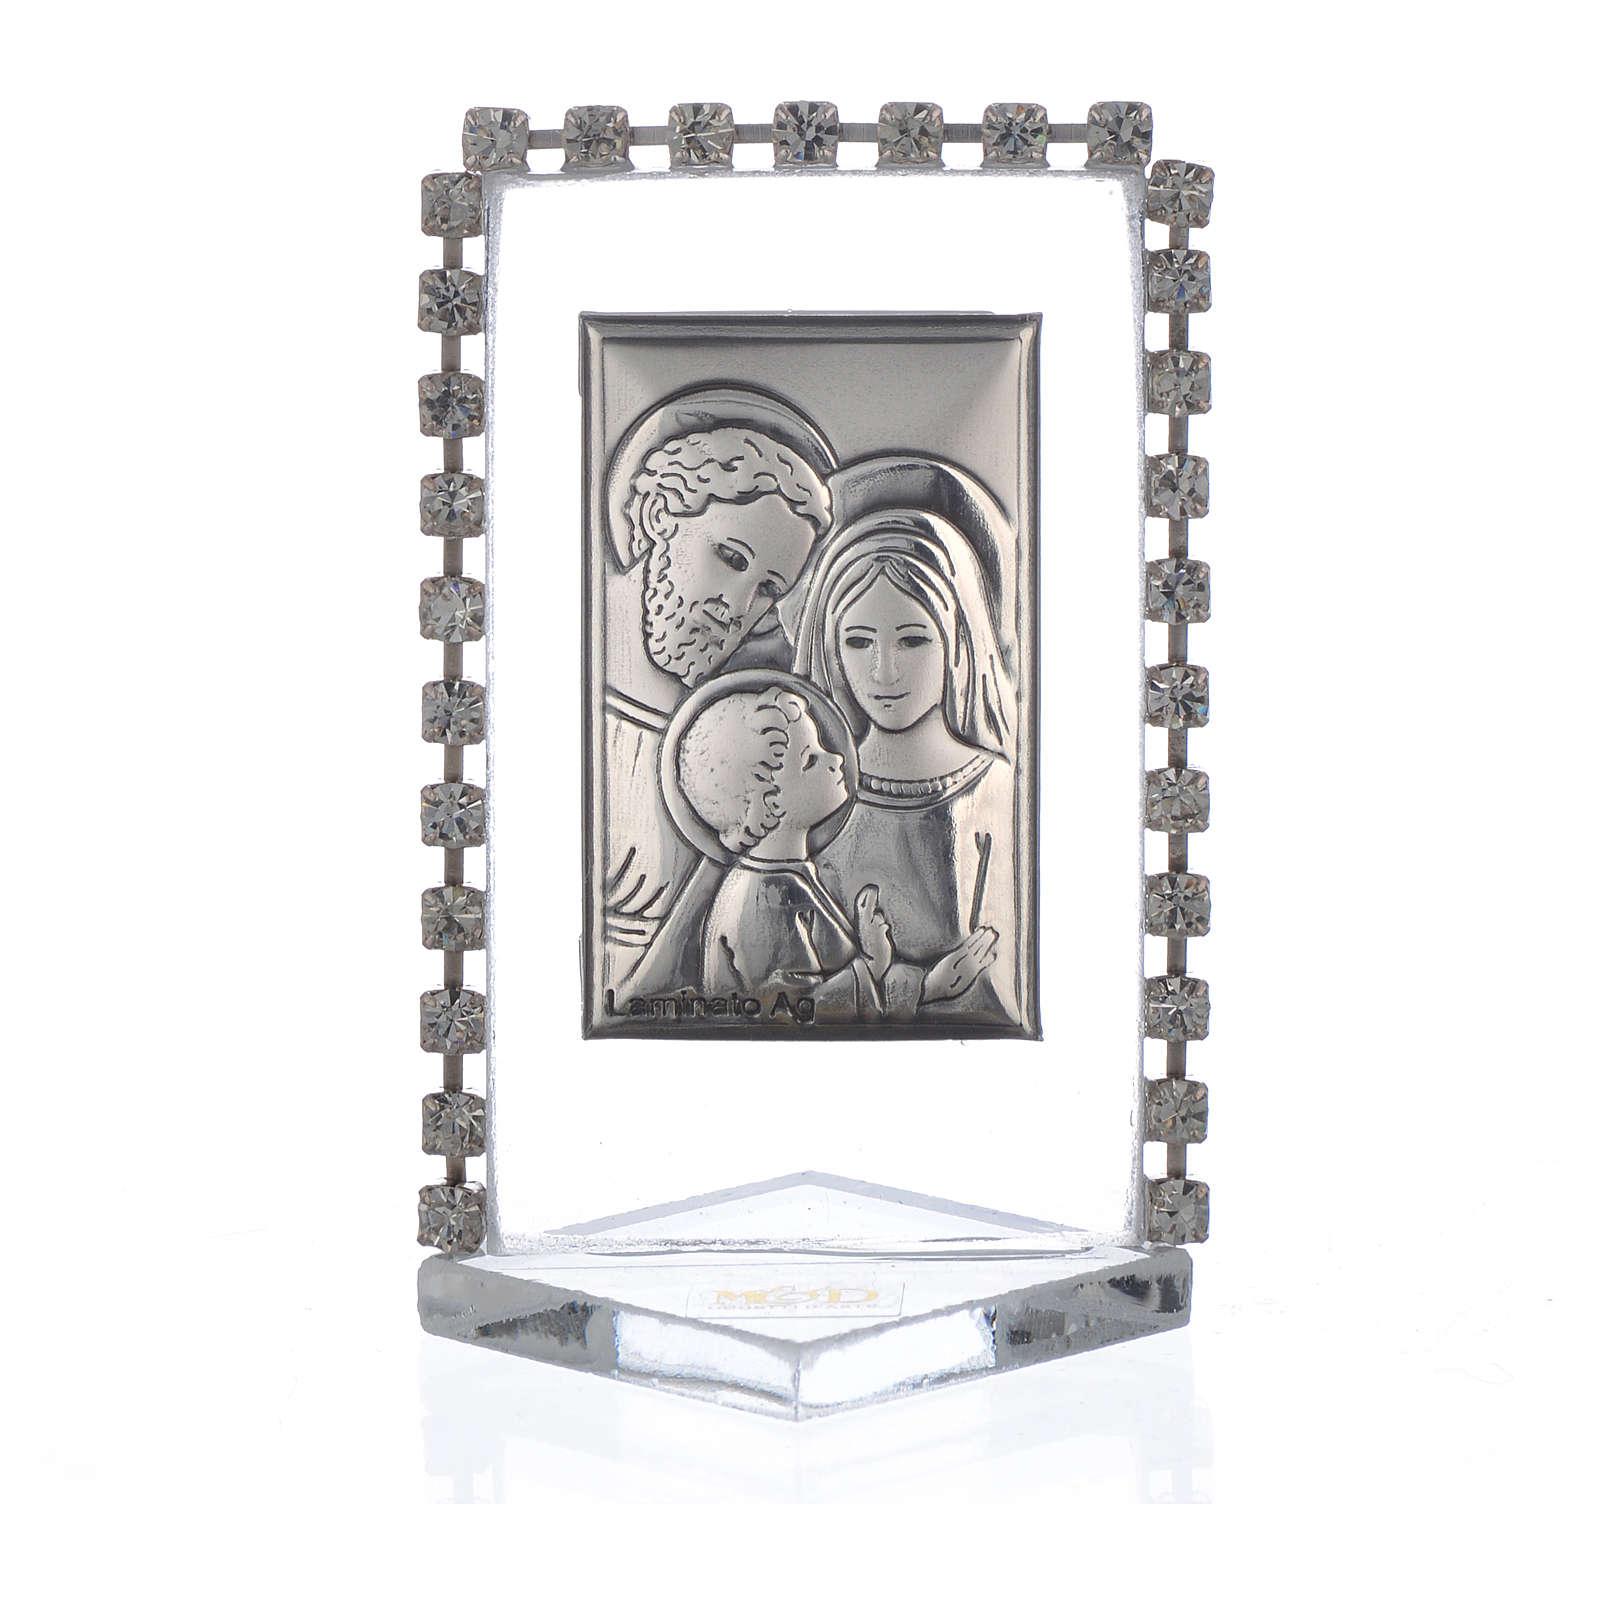 Bomboniera Matrimonio Quadretto Sacra Famiglia strass 5,5x 3,5 3